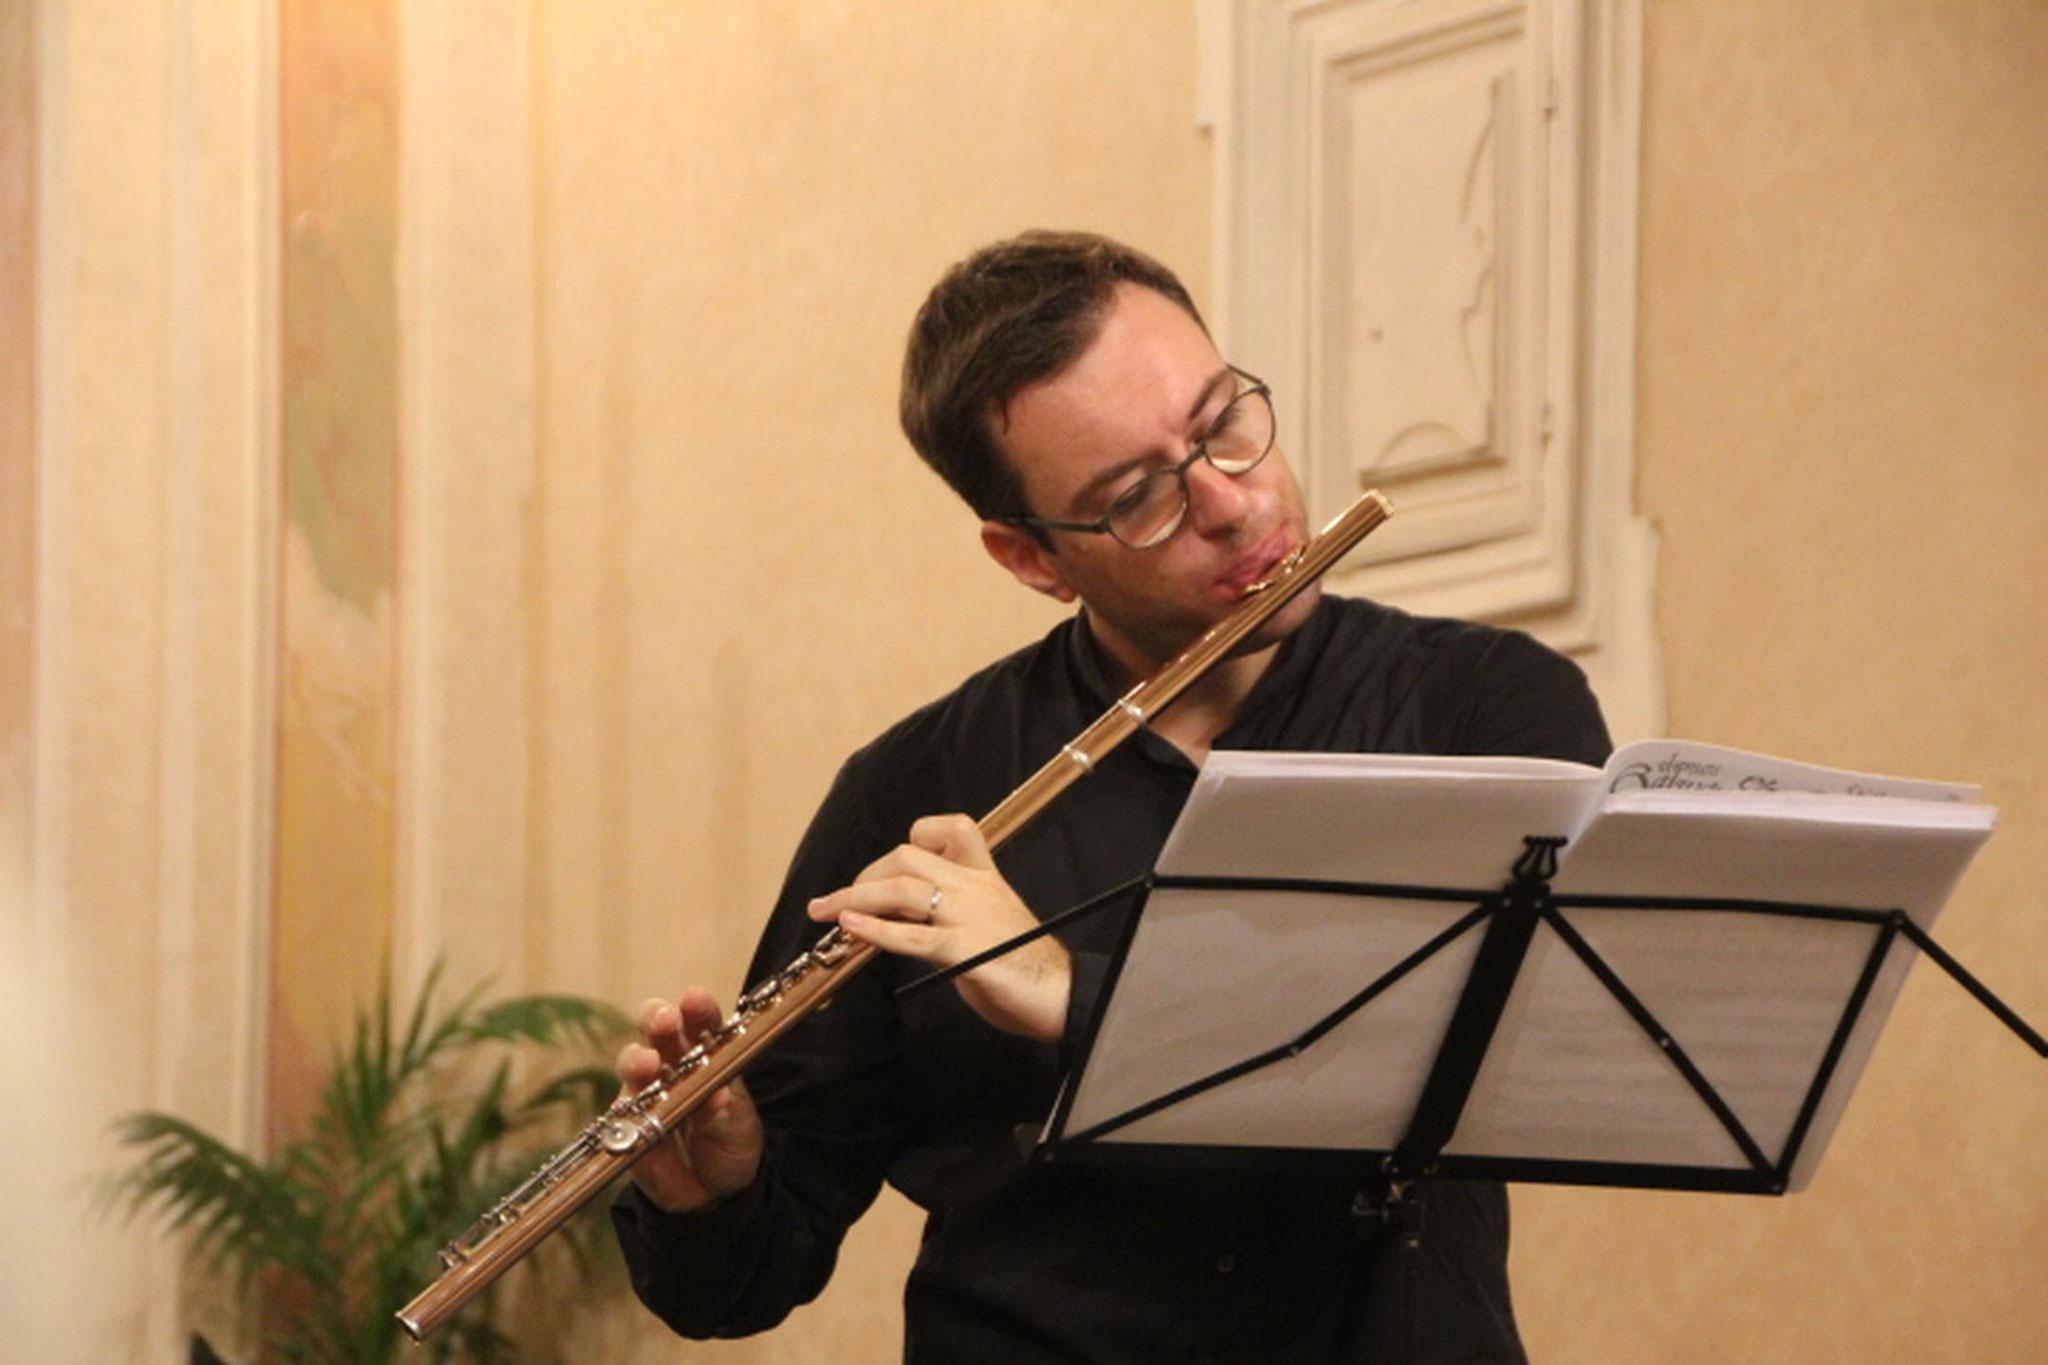 Concert à la Chapelle di Prandaglio : Matteo Bendetti en concert avec Clara Martello